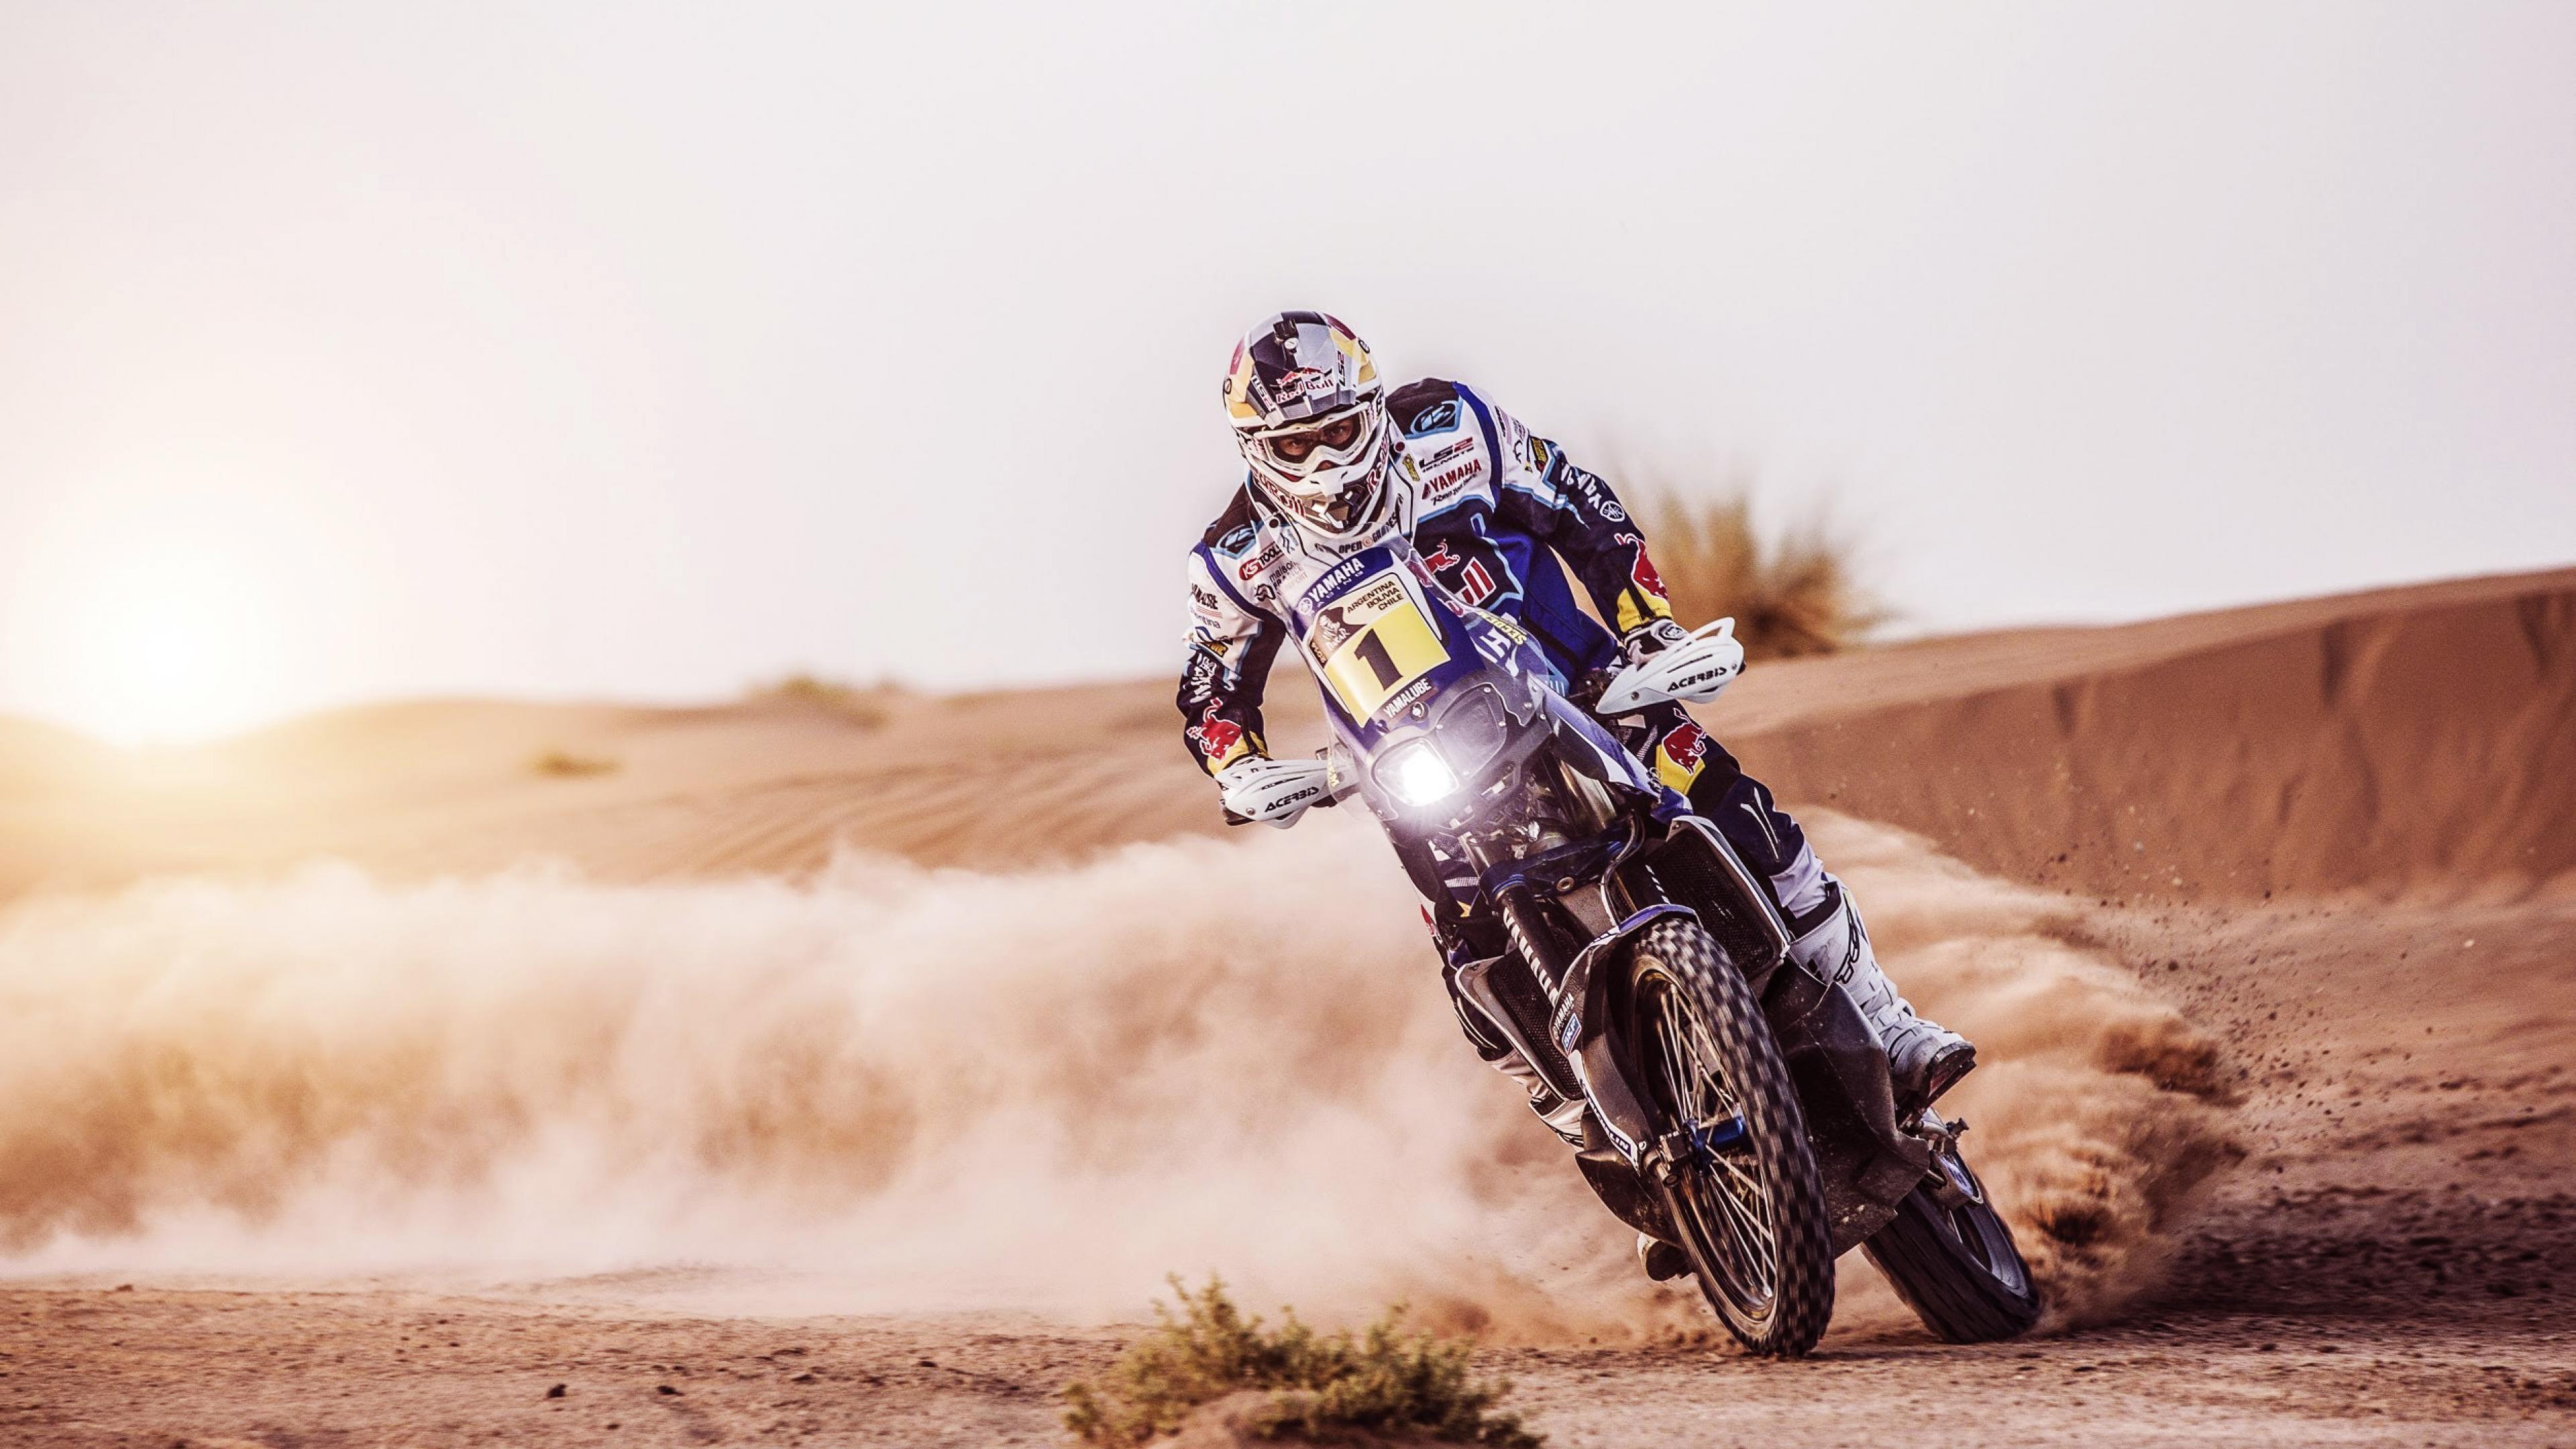 wallpaper.wiki-HD-wallpaper-dirt-bike-sand-race-